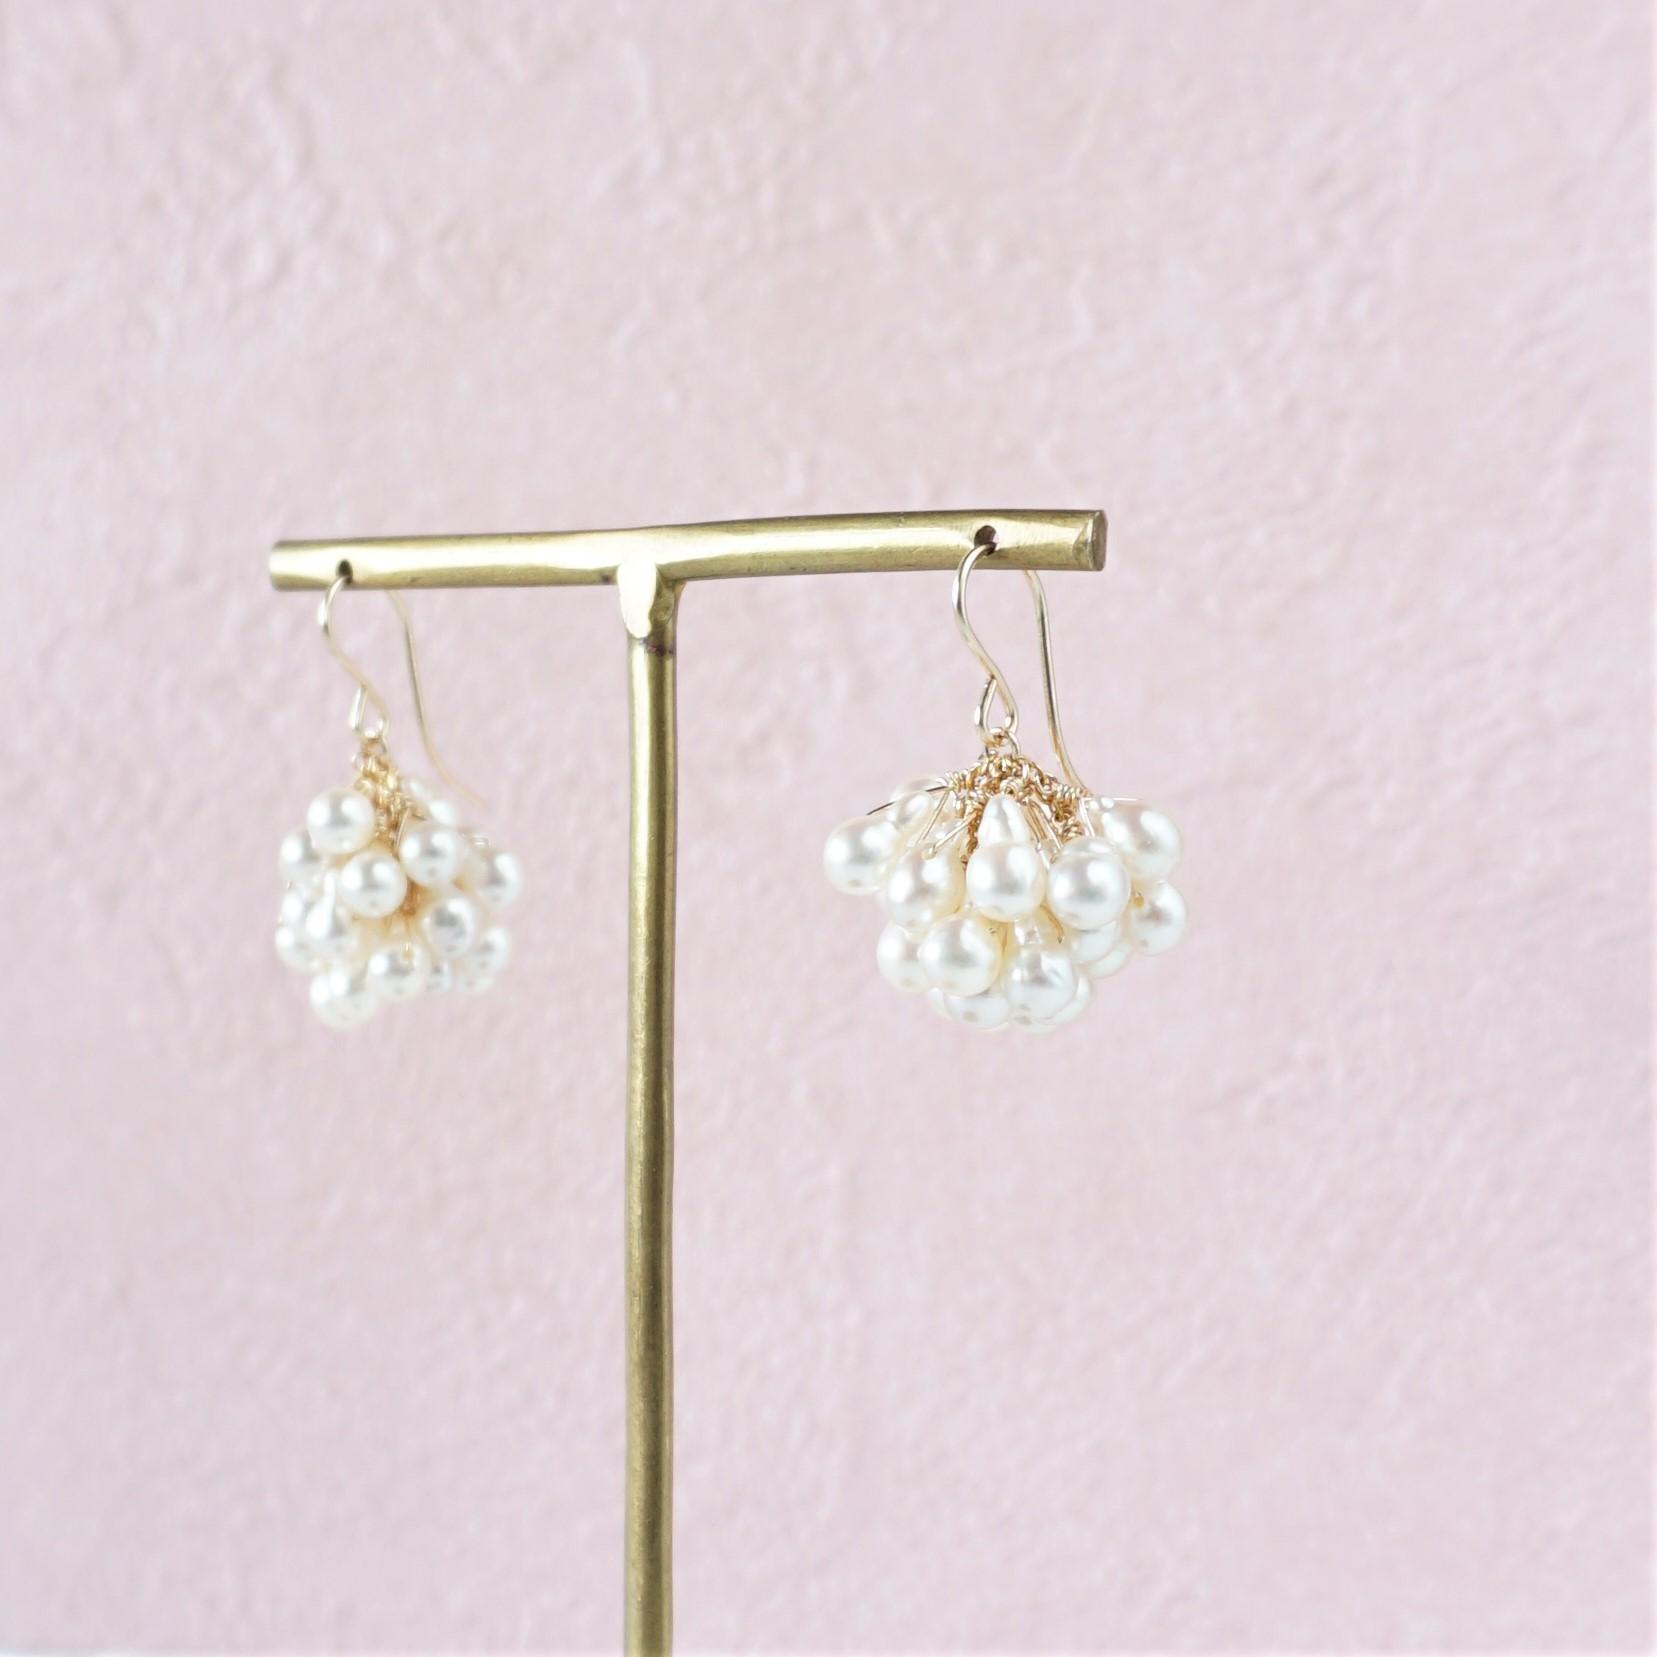 送料無料14kgf*Akoya volume pearls pierced earring / earring